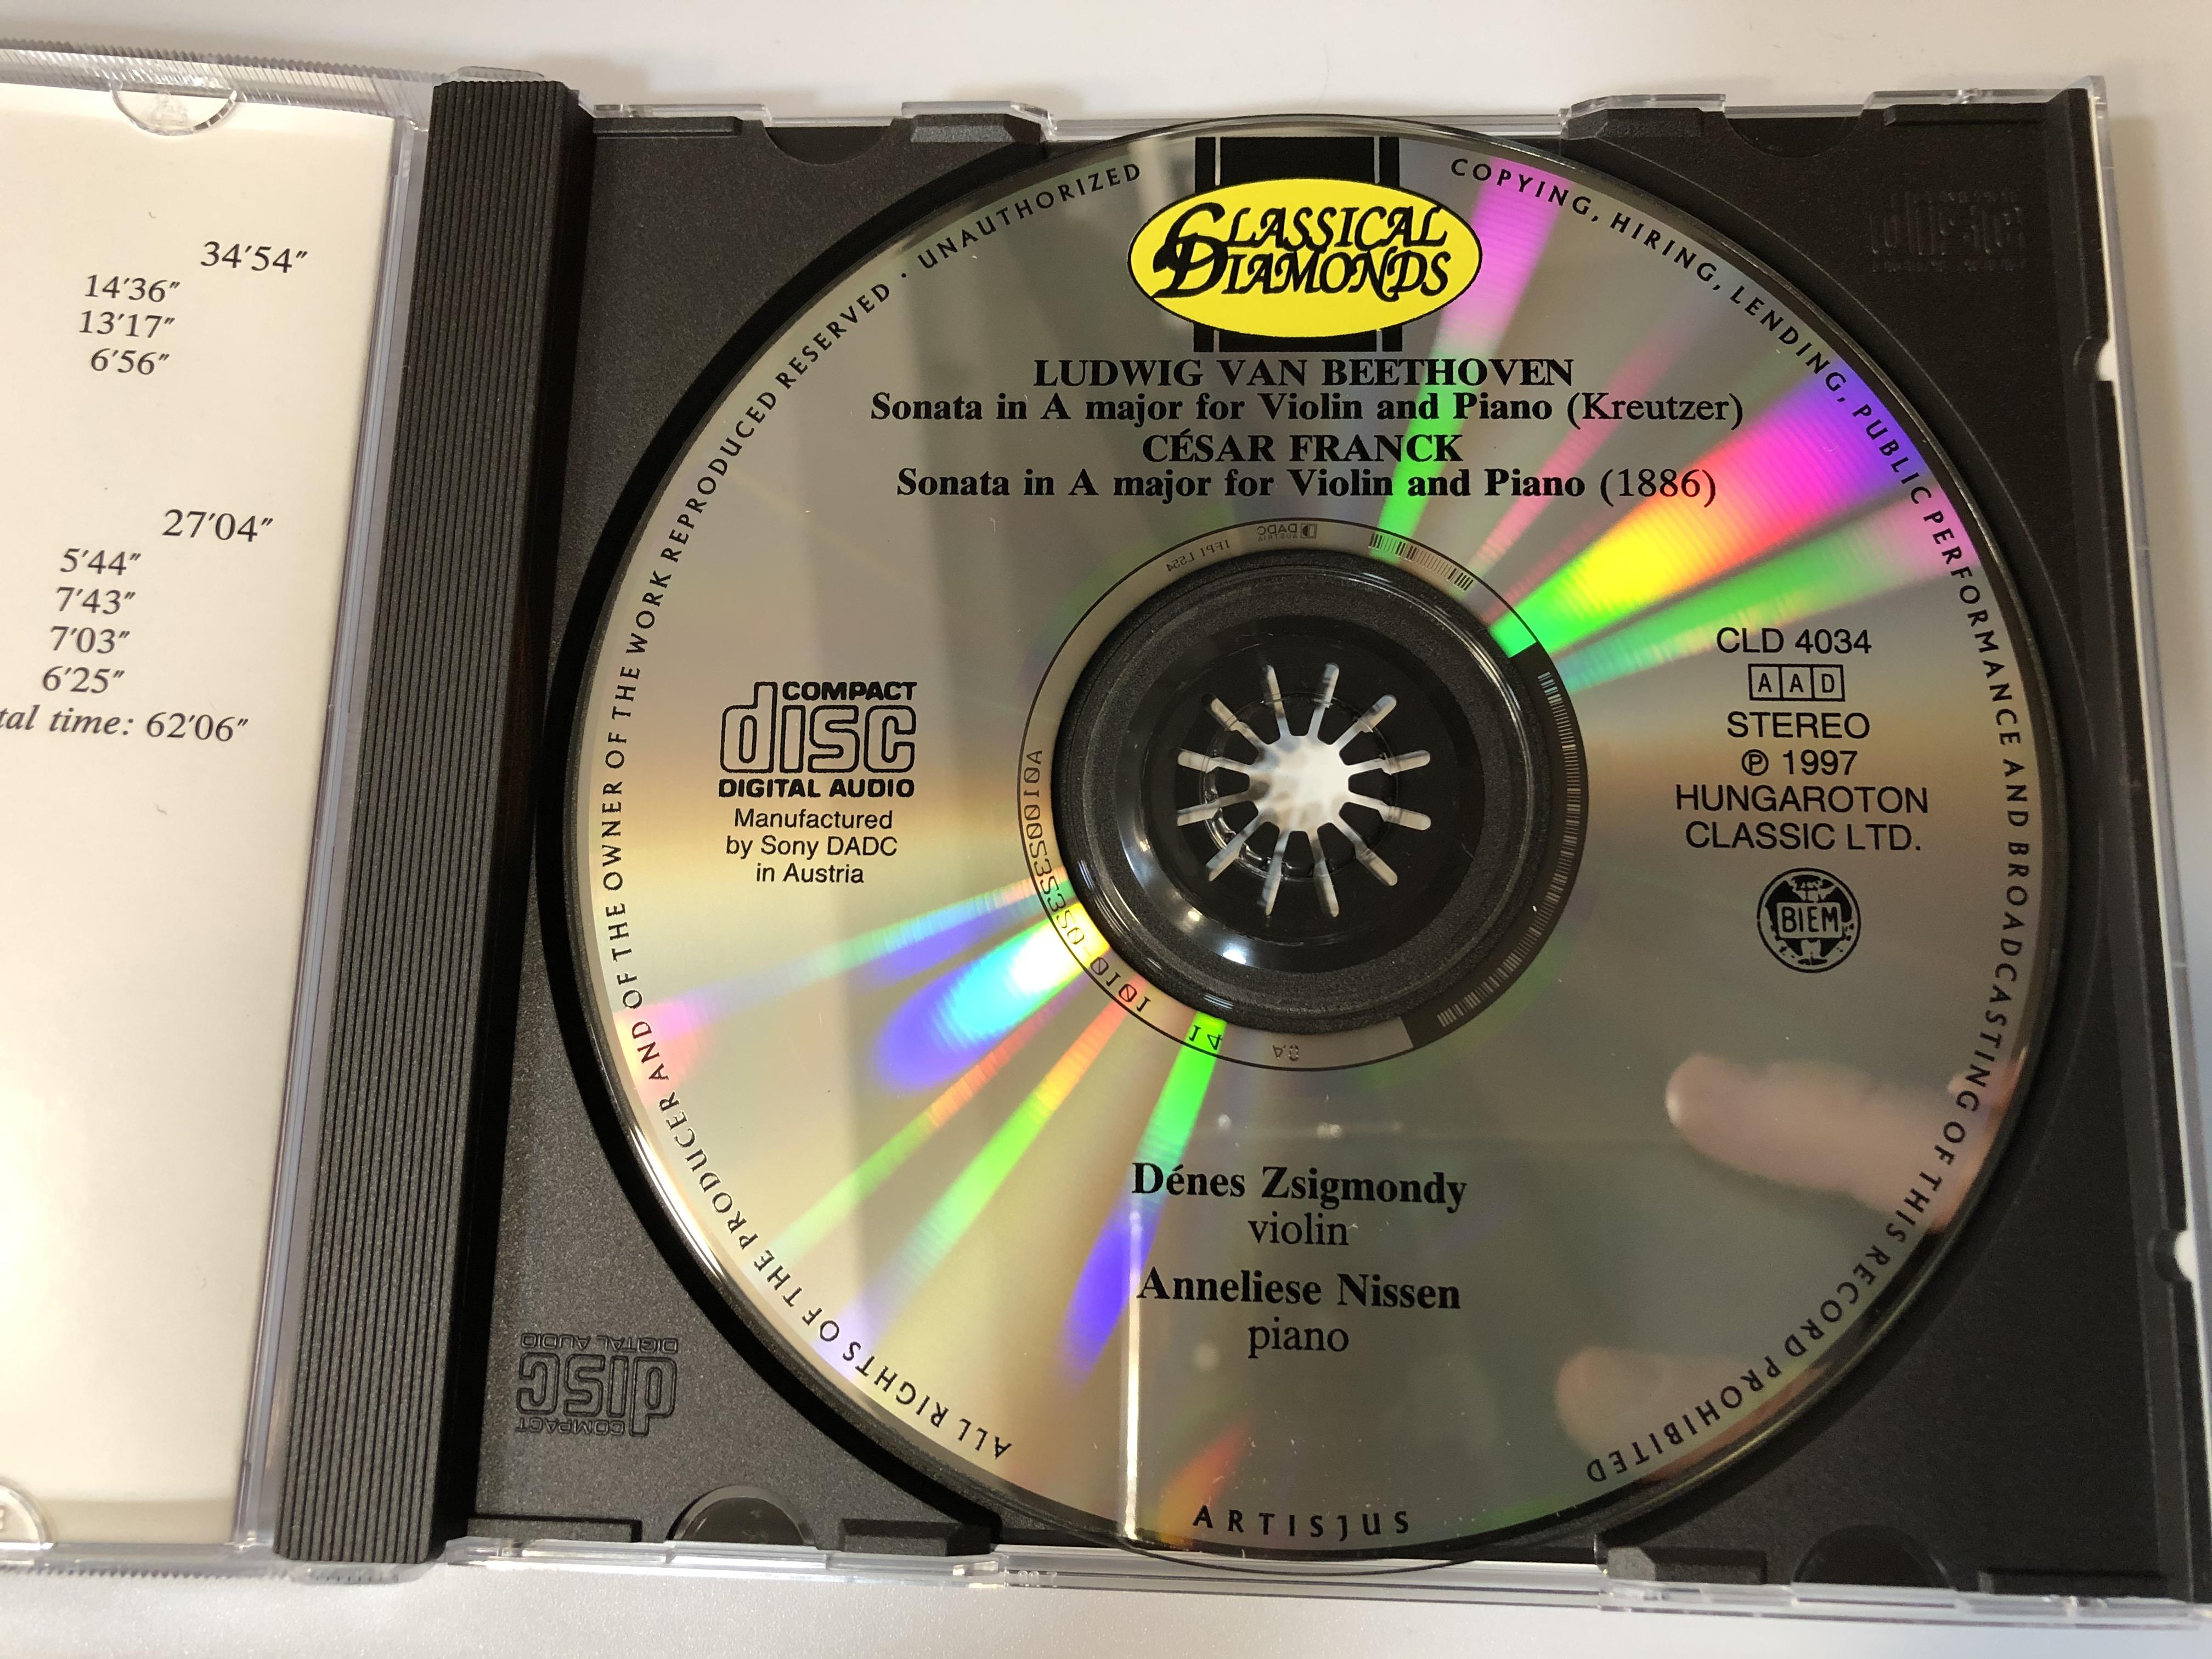 beethoven-sonata-in-a-major-kreutzer-cesar-franck-sonata-in-a-major-denes-zsigmondy-violin-anneliese-nissen-piano-classical-diamonds-hungaroton-classic-audio-cd-1997-stereo-cld-4-5-.jpg